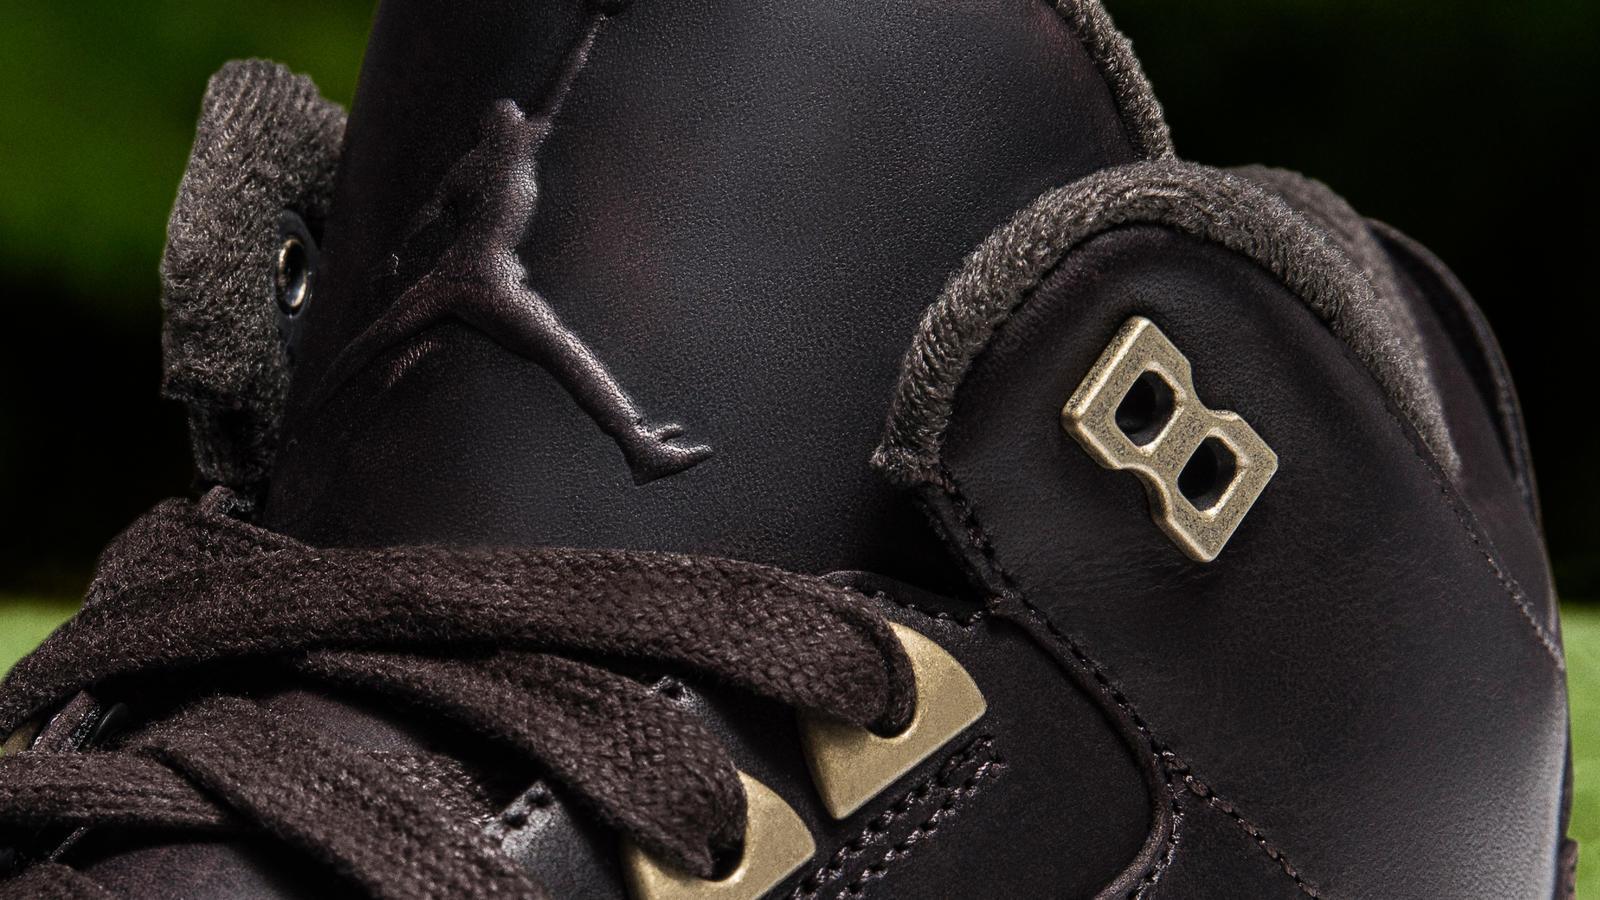 fd4f464c8a63 Air Jordan III Golf Premium - Nike News